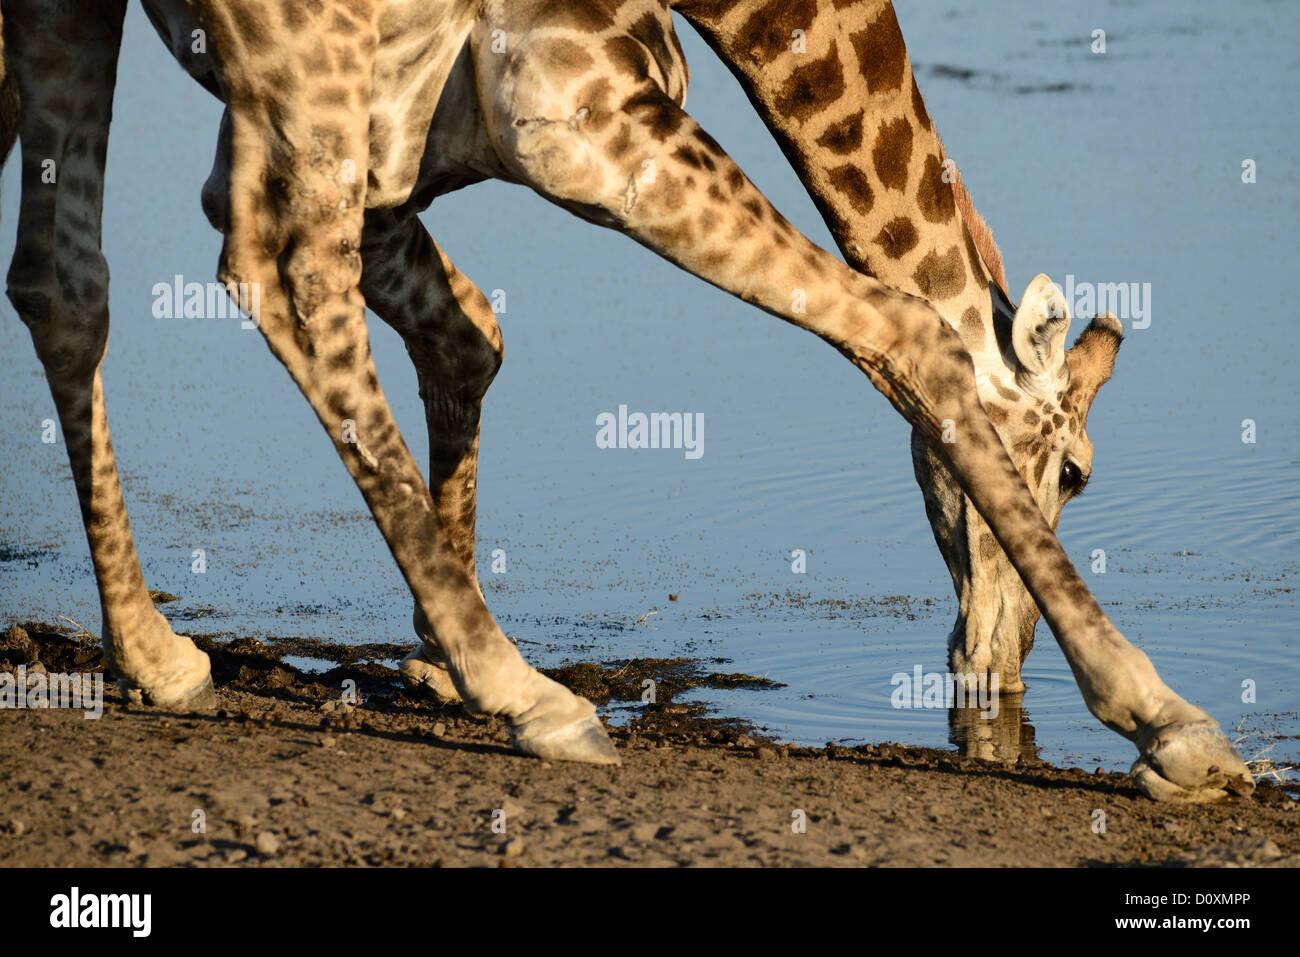 Africa, Etosha, National Park, Namibia, african, animal, bending over, drinking, giraffe, animals, horizontal, plains, Stock Photo